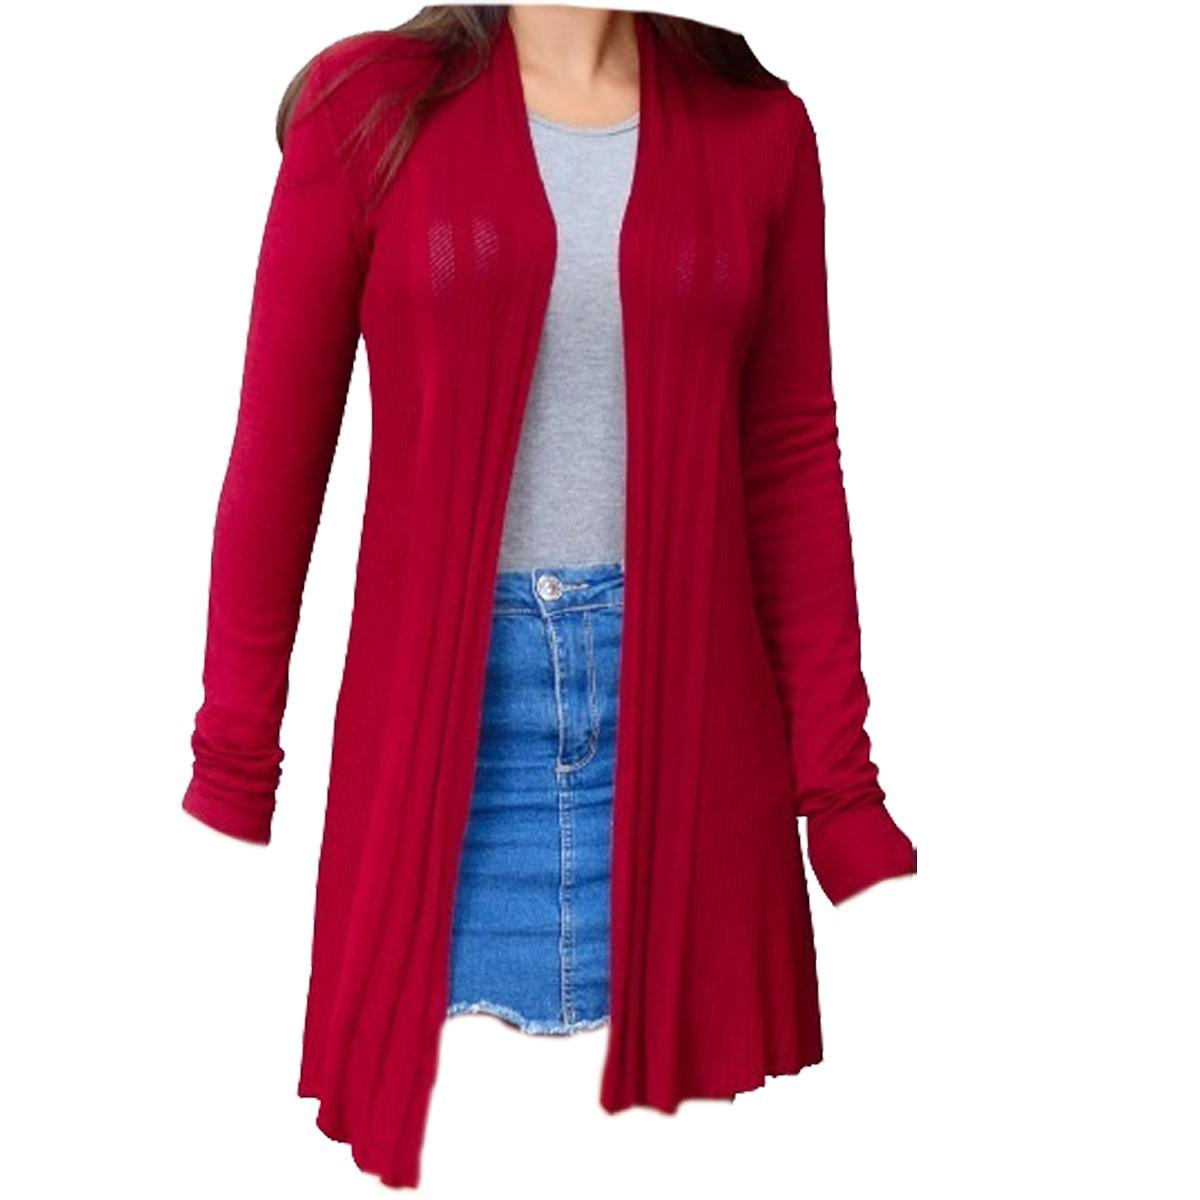 c77ba1a840 sueter cardiga blusa camisa feminina cardigan tricot 2763. Carregando zoom.